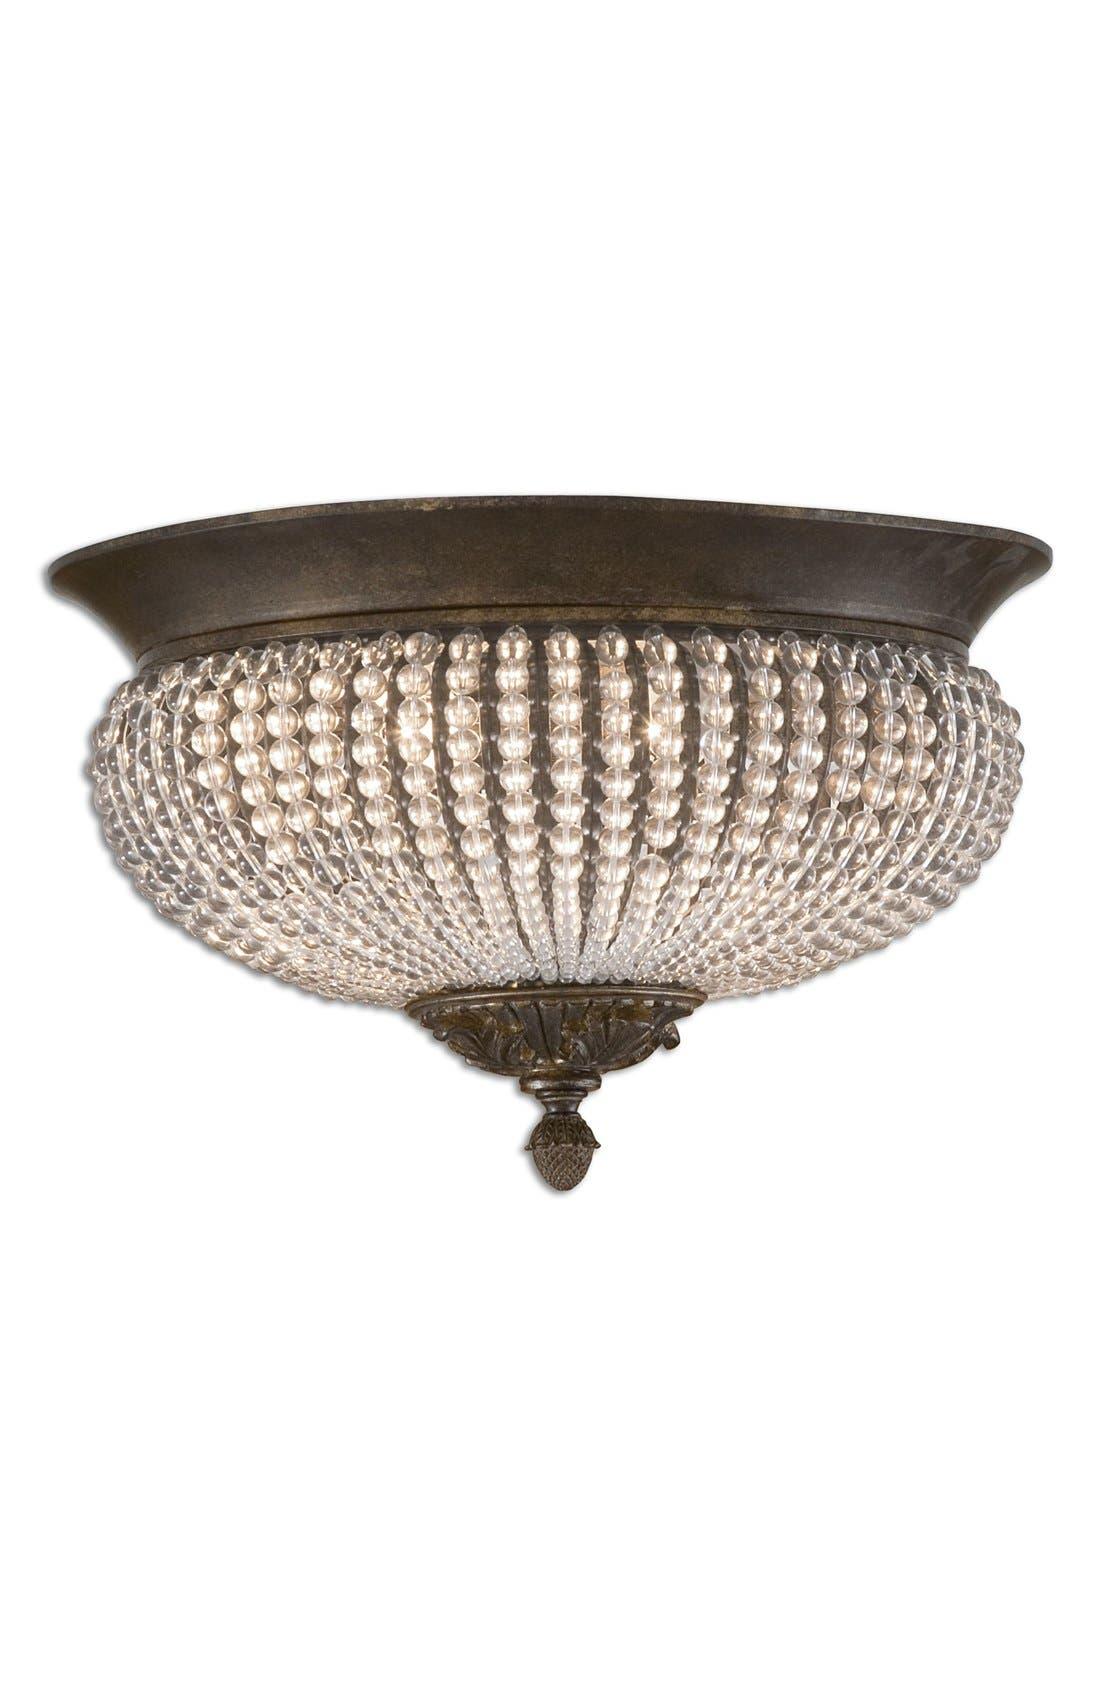 Alternate Image 1 Selected - Uttermost 'Cristal de Lisbon' Ceiling Light